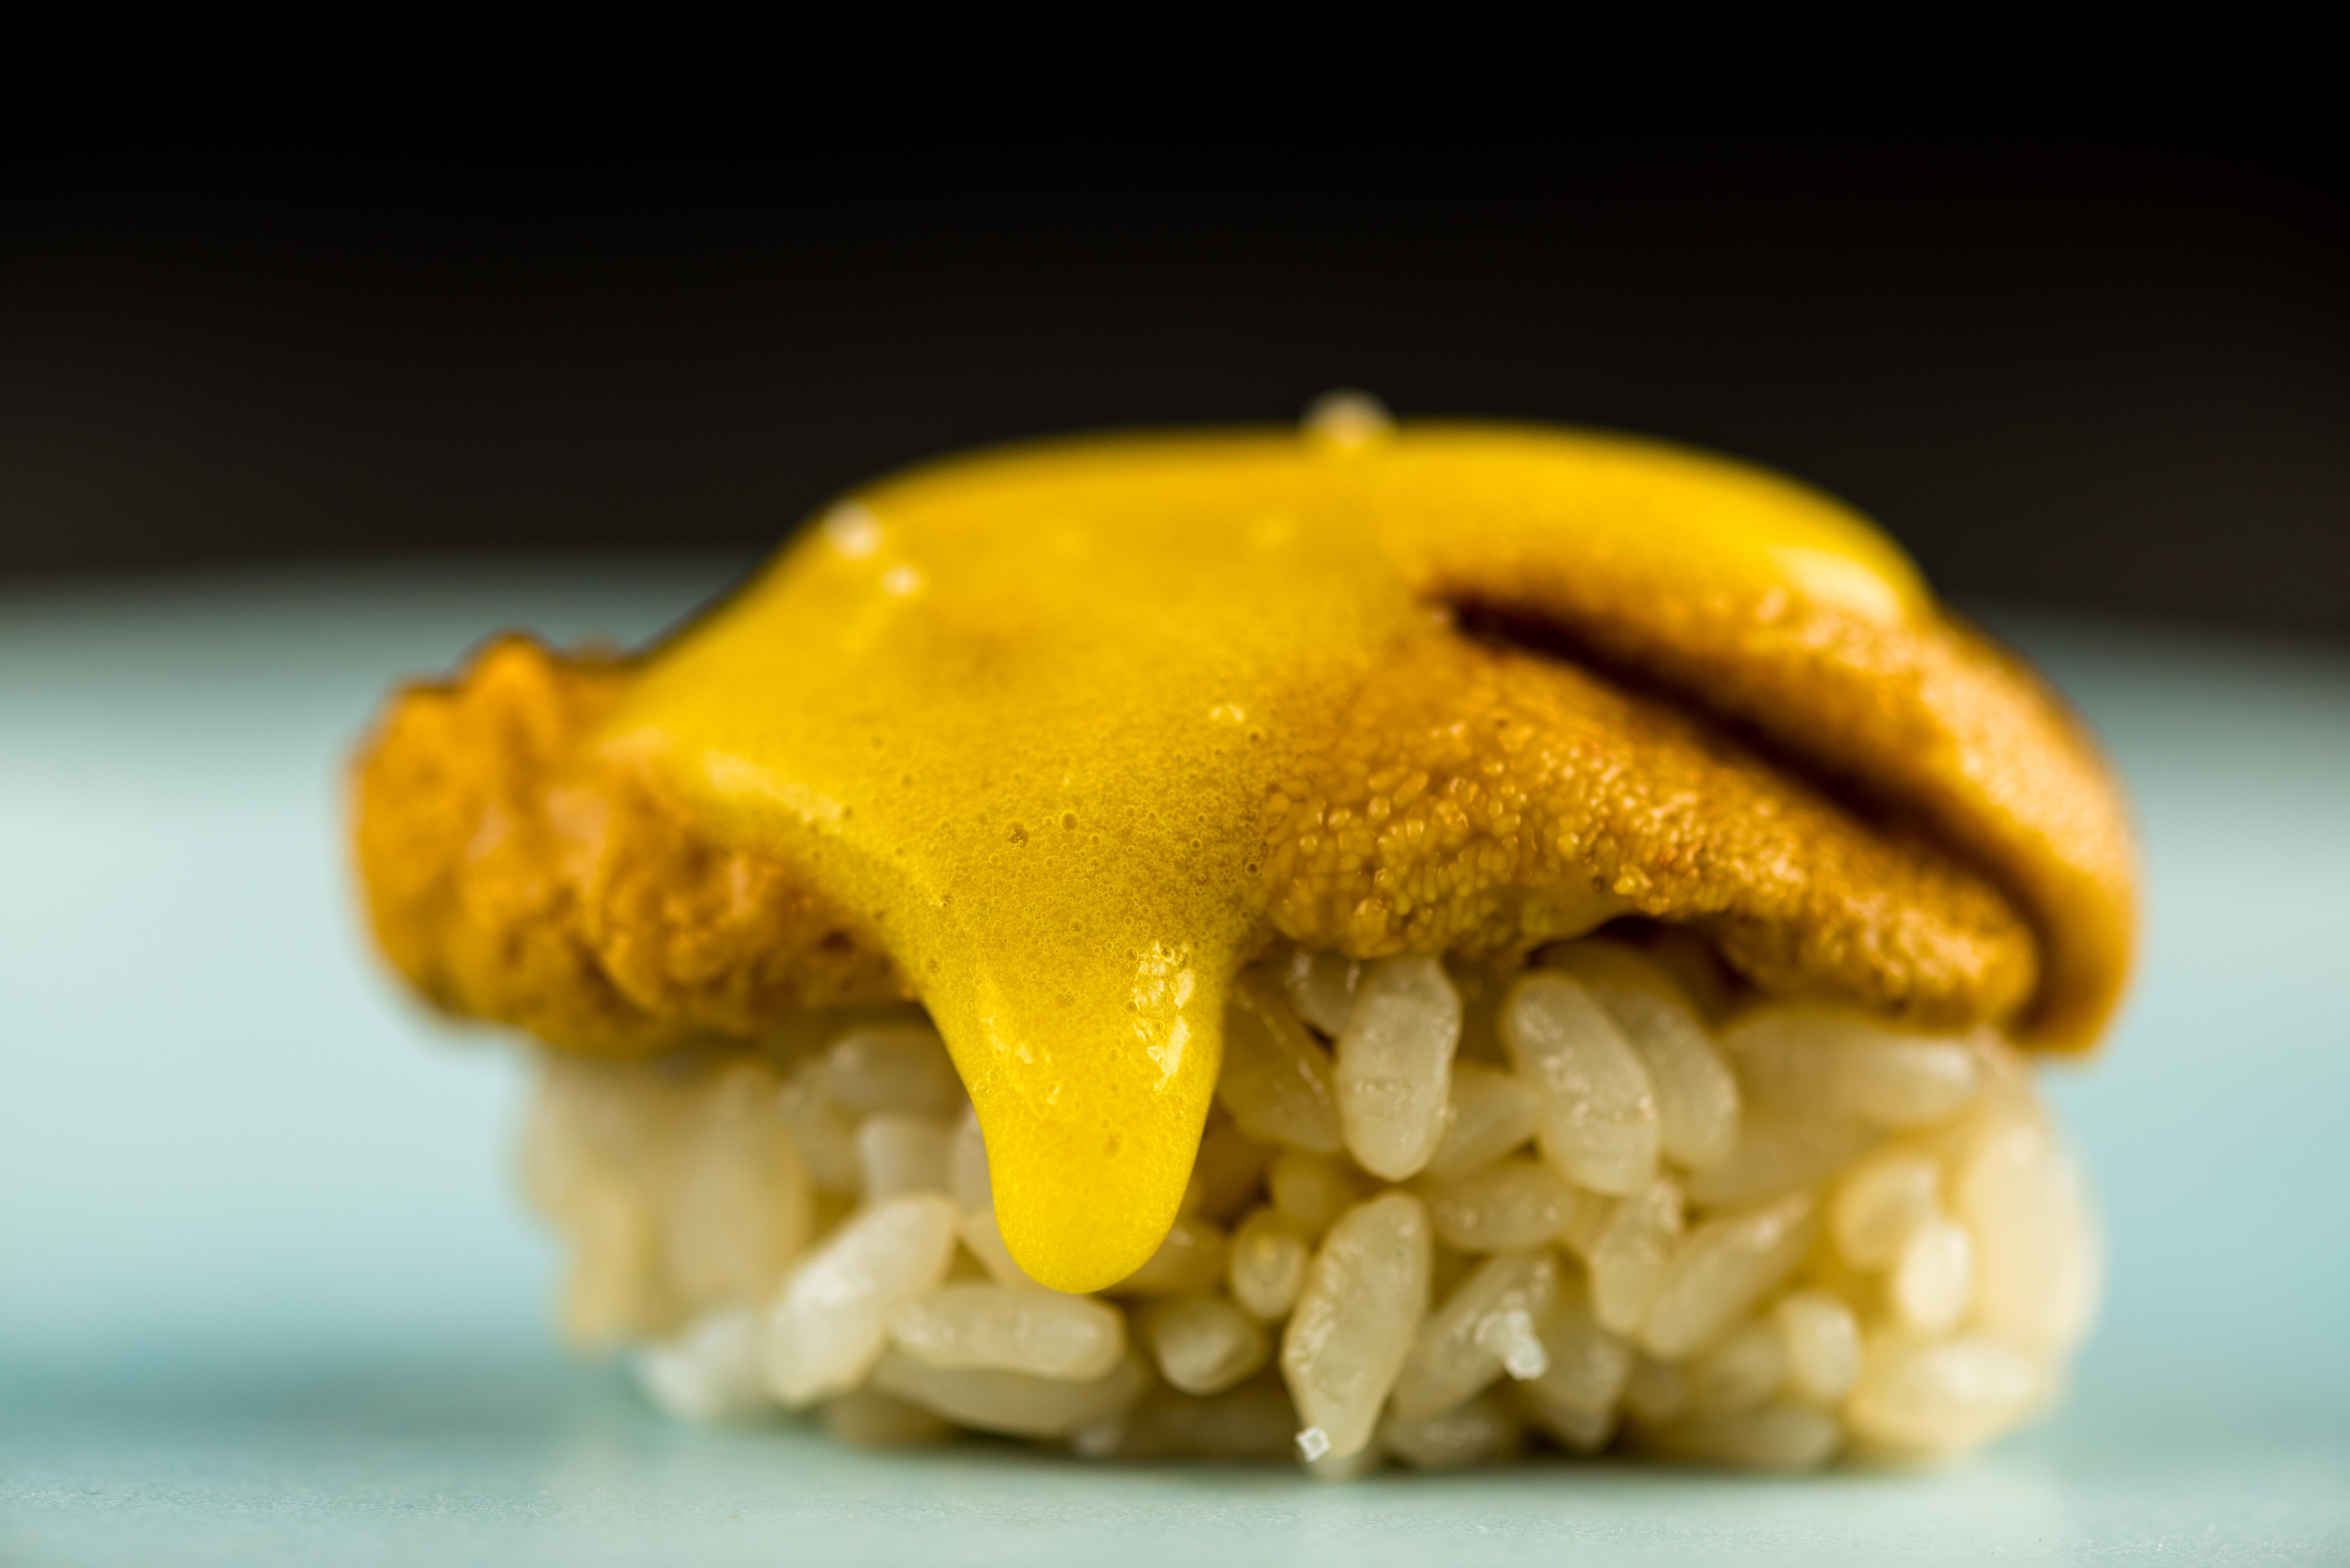 Santa Barbara uni with a shiro dashi-emulsified egg yolk, lemon, and soy